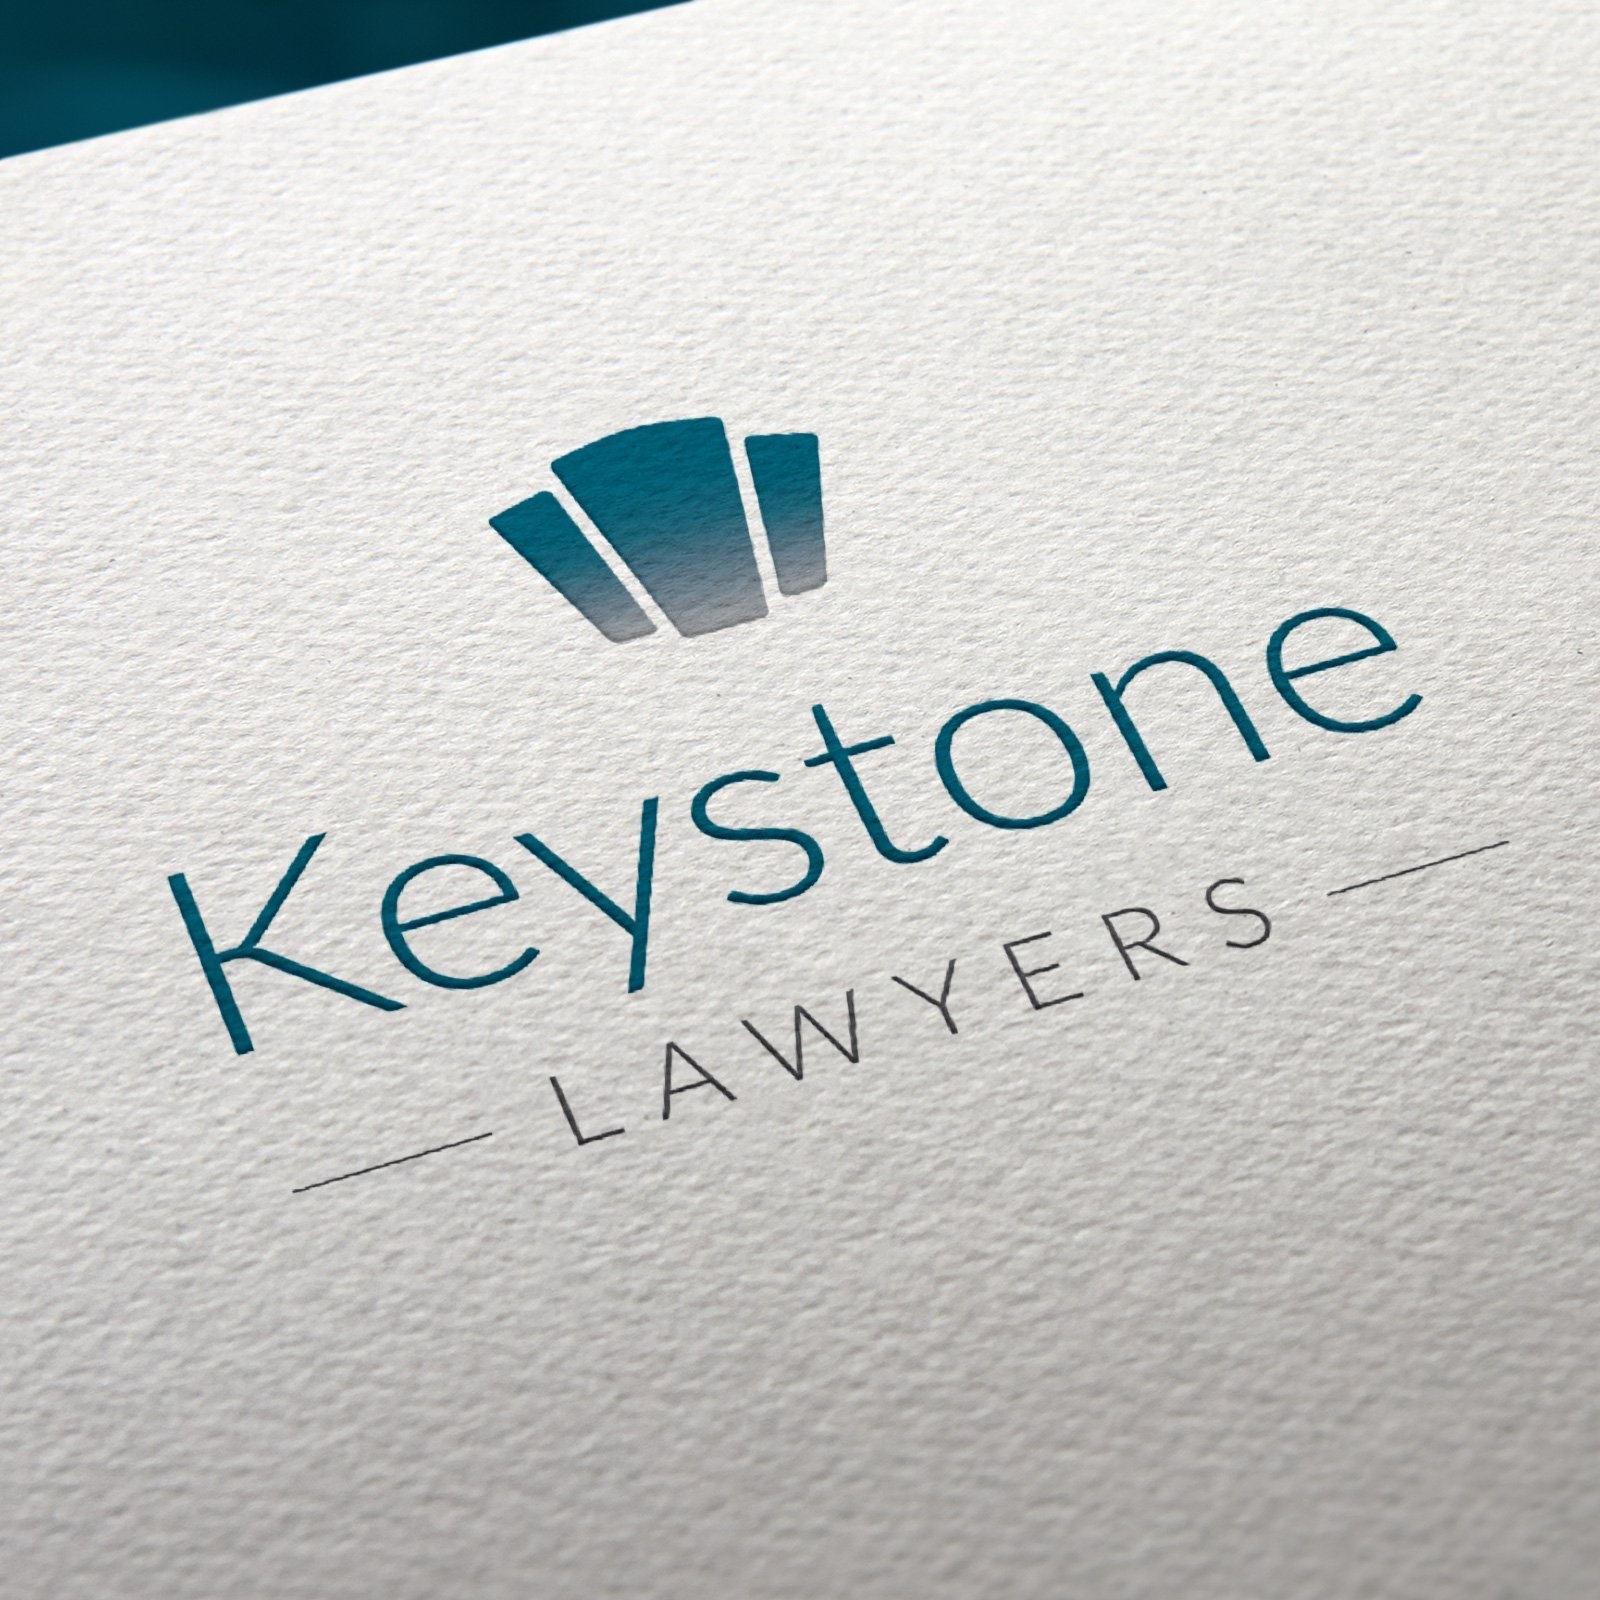 Keystone Lawyers Logo Design